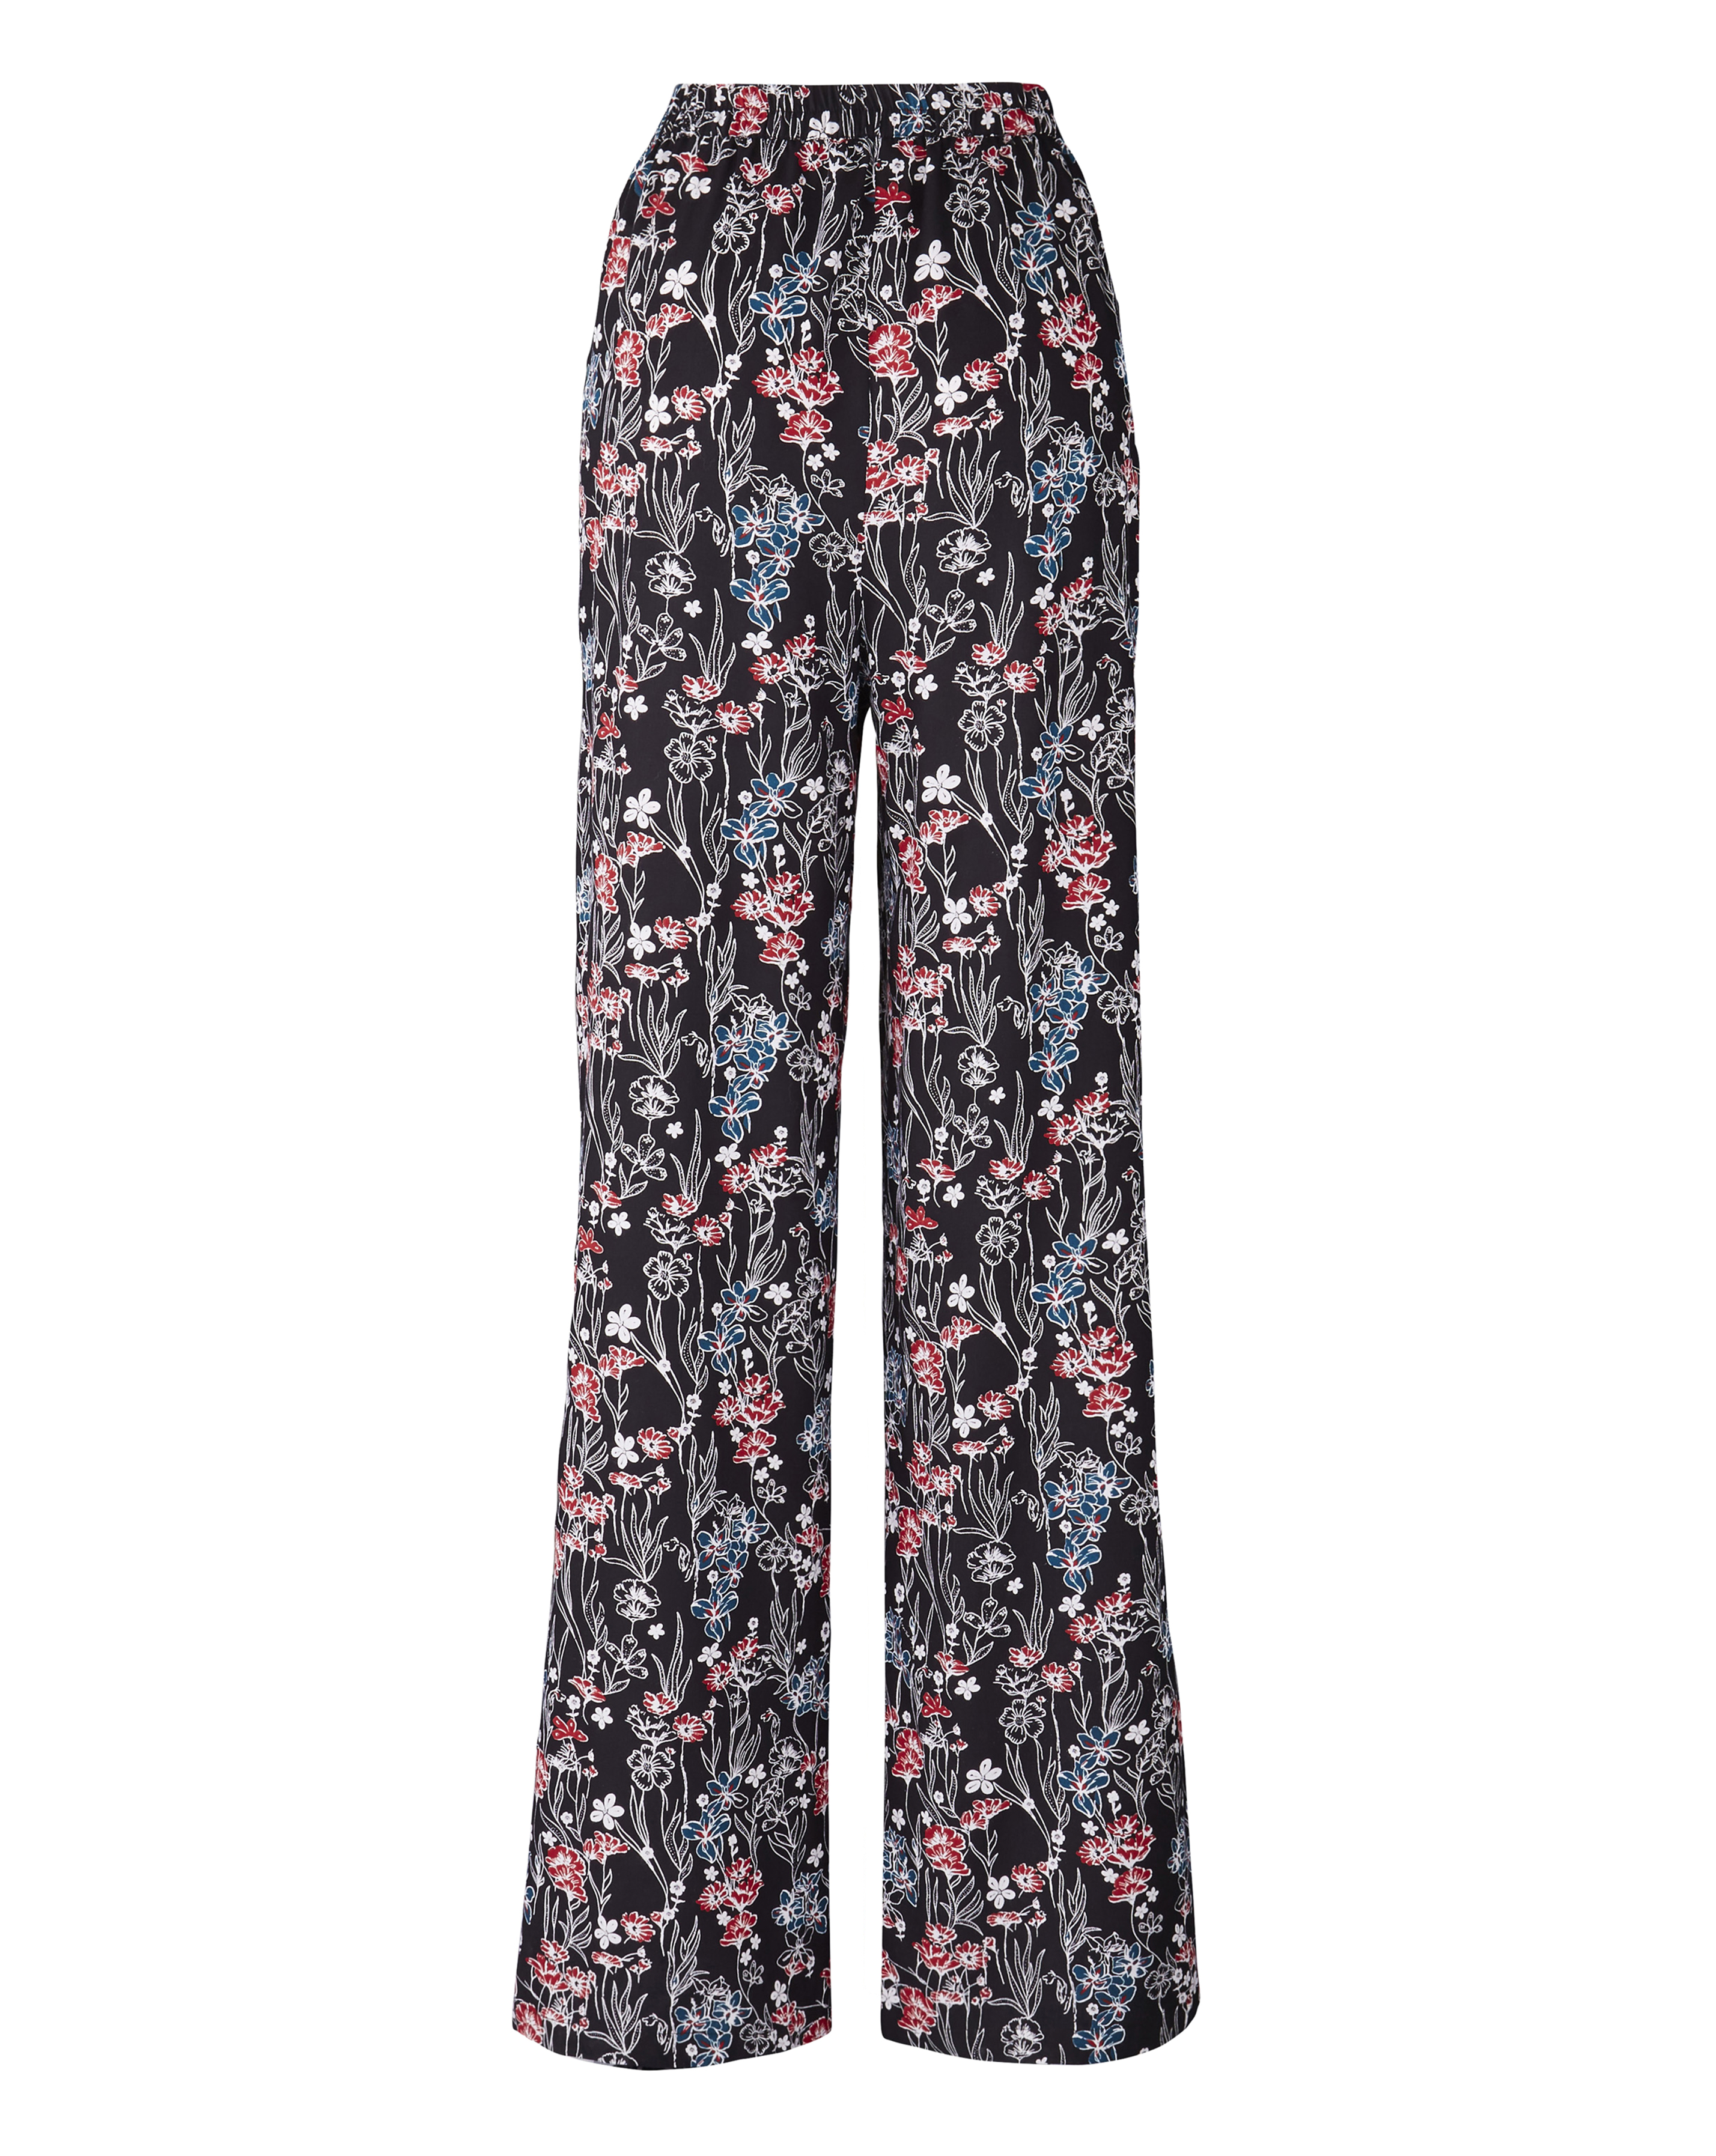 Womens Printed Wide Leg Trouser JD Williams